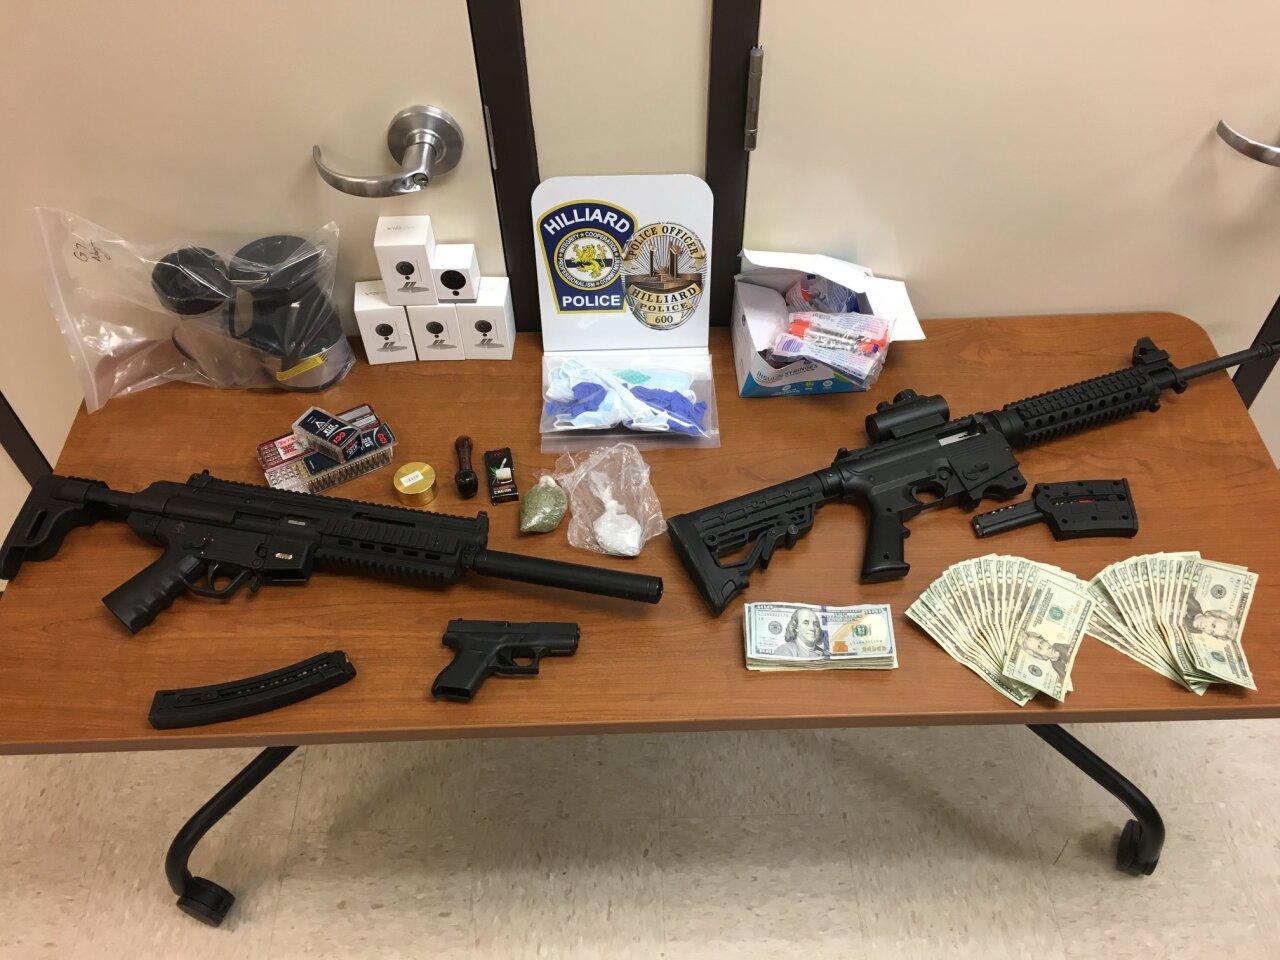 Hilliard Division of Police Columbus drug raid.jpg